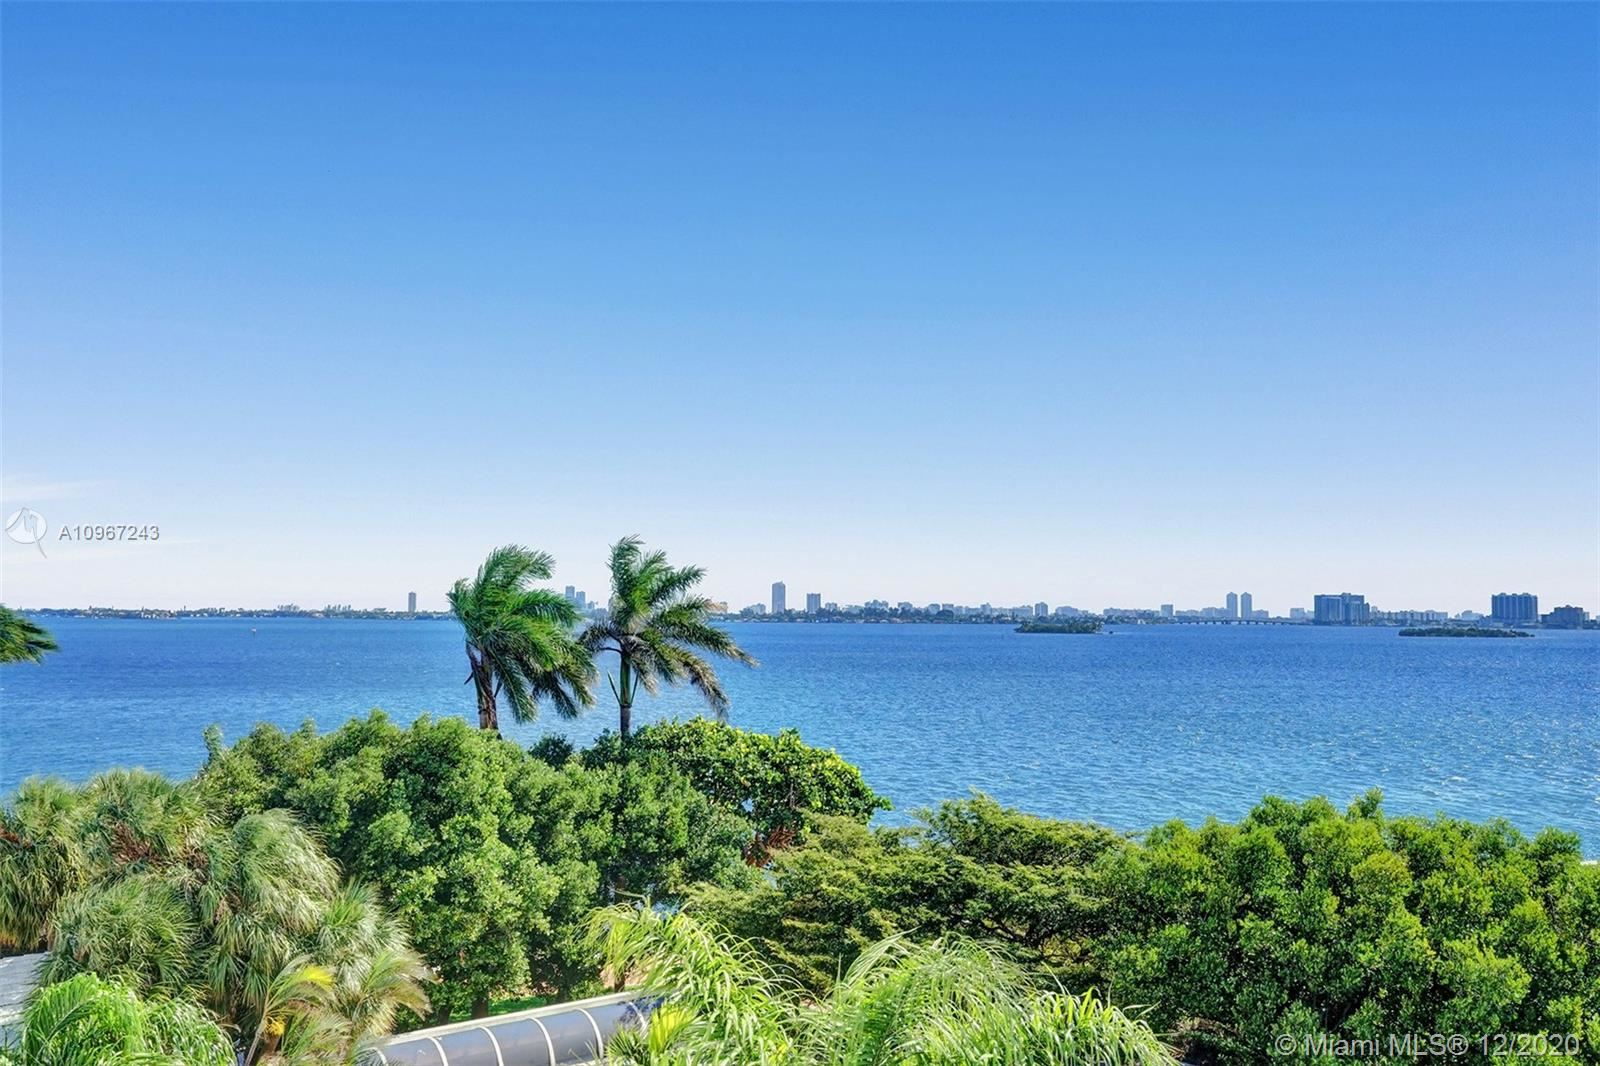 4000 Towerside Ter #604, Miami, FL 33138 - #: A10967243